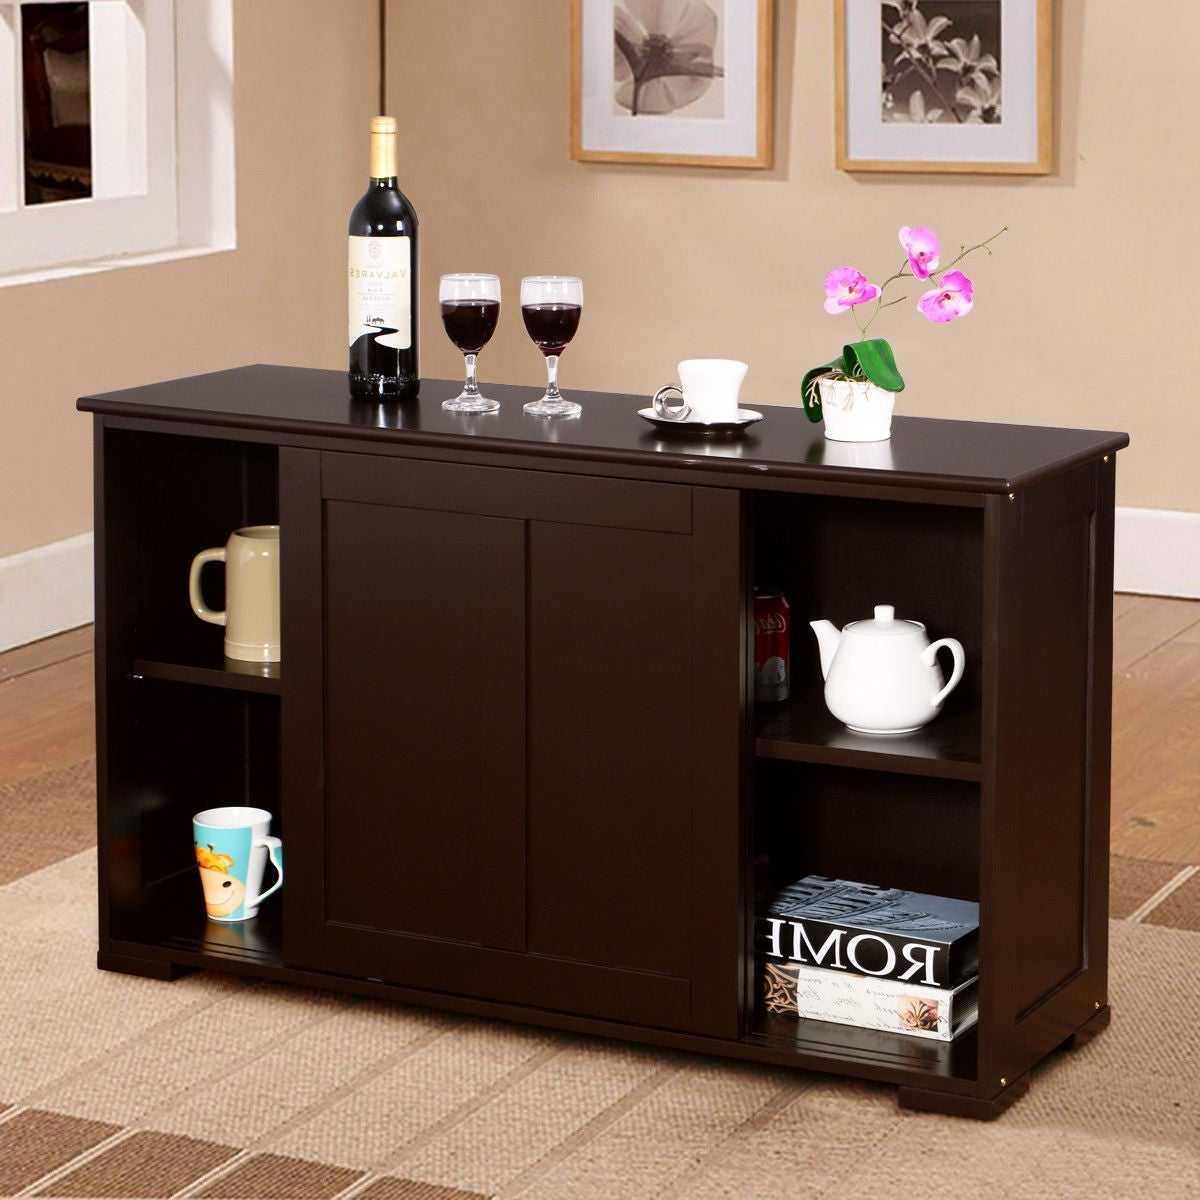 Shop Costway Kitchen Storage Cabinet Sideboard Buffet Cupboard Wood